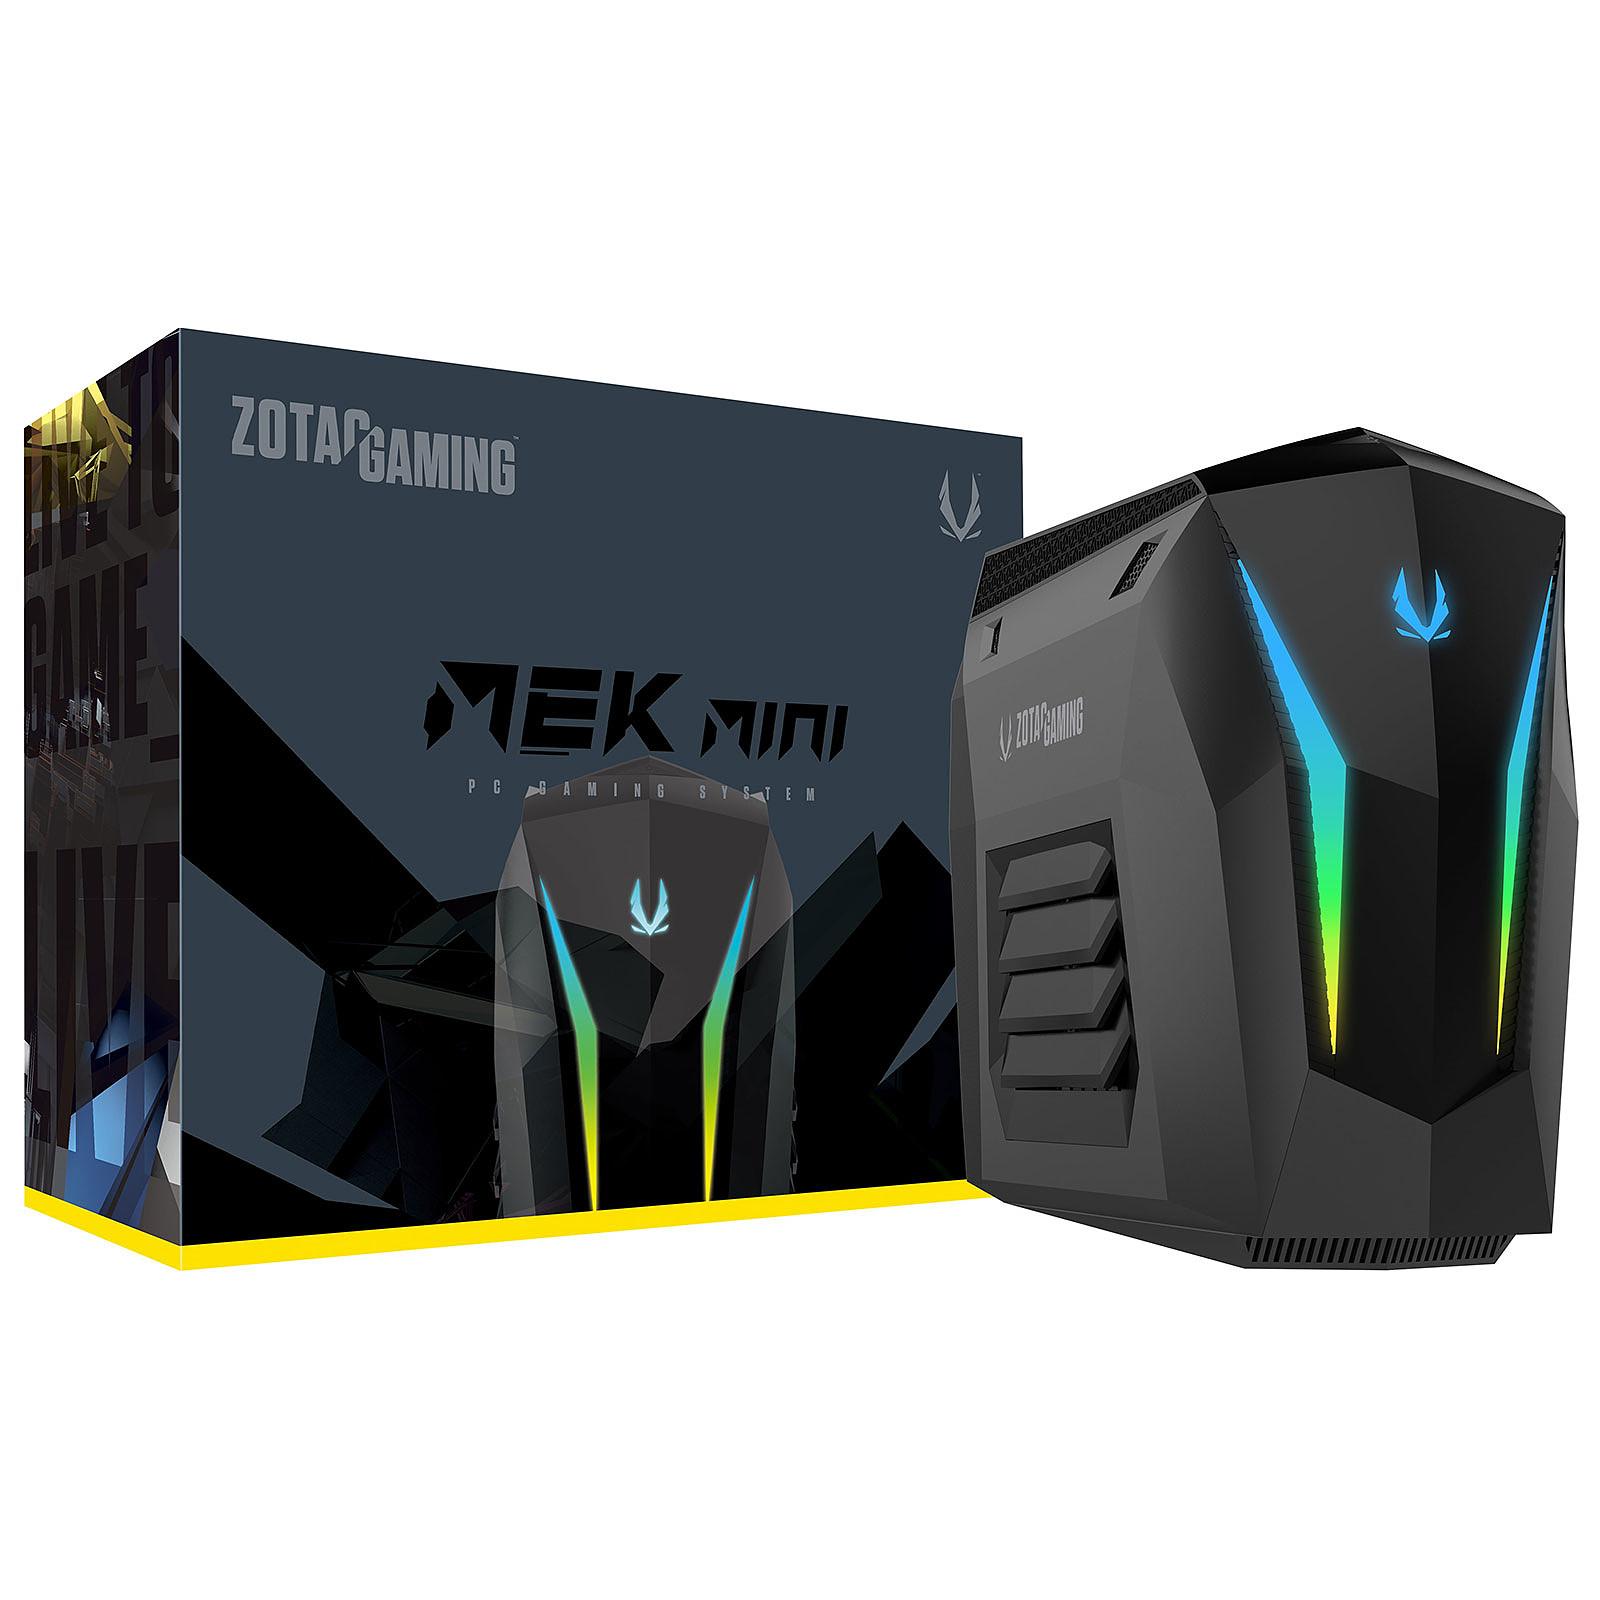 ZOTAC MEK MINI (GM2070C7R1B)